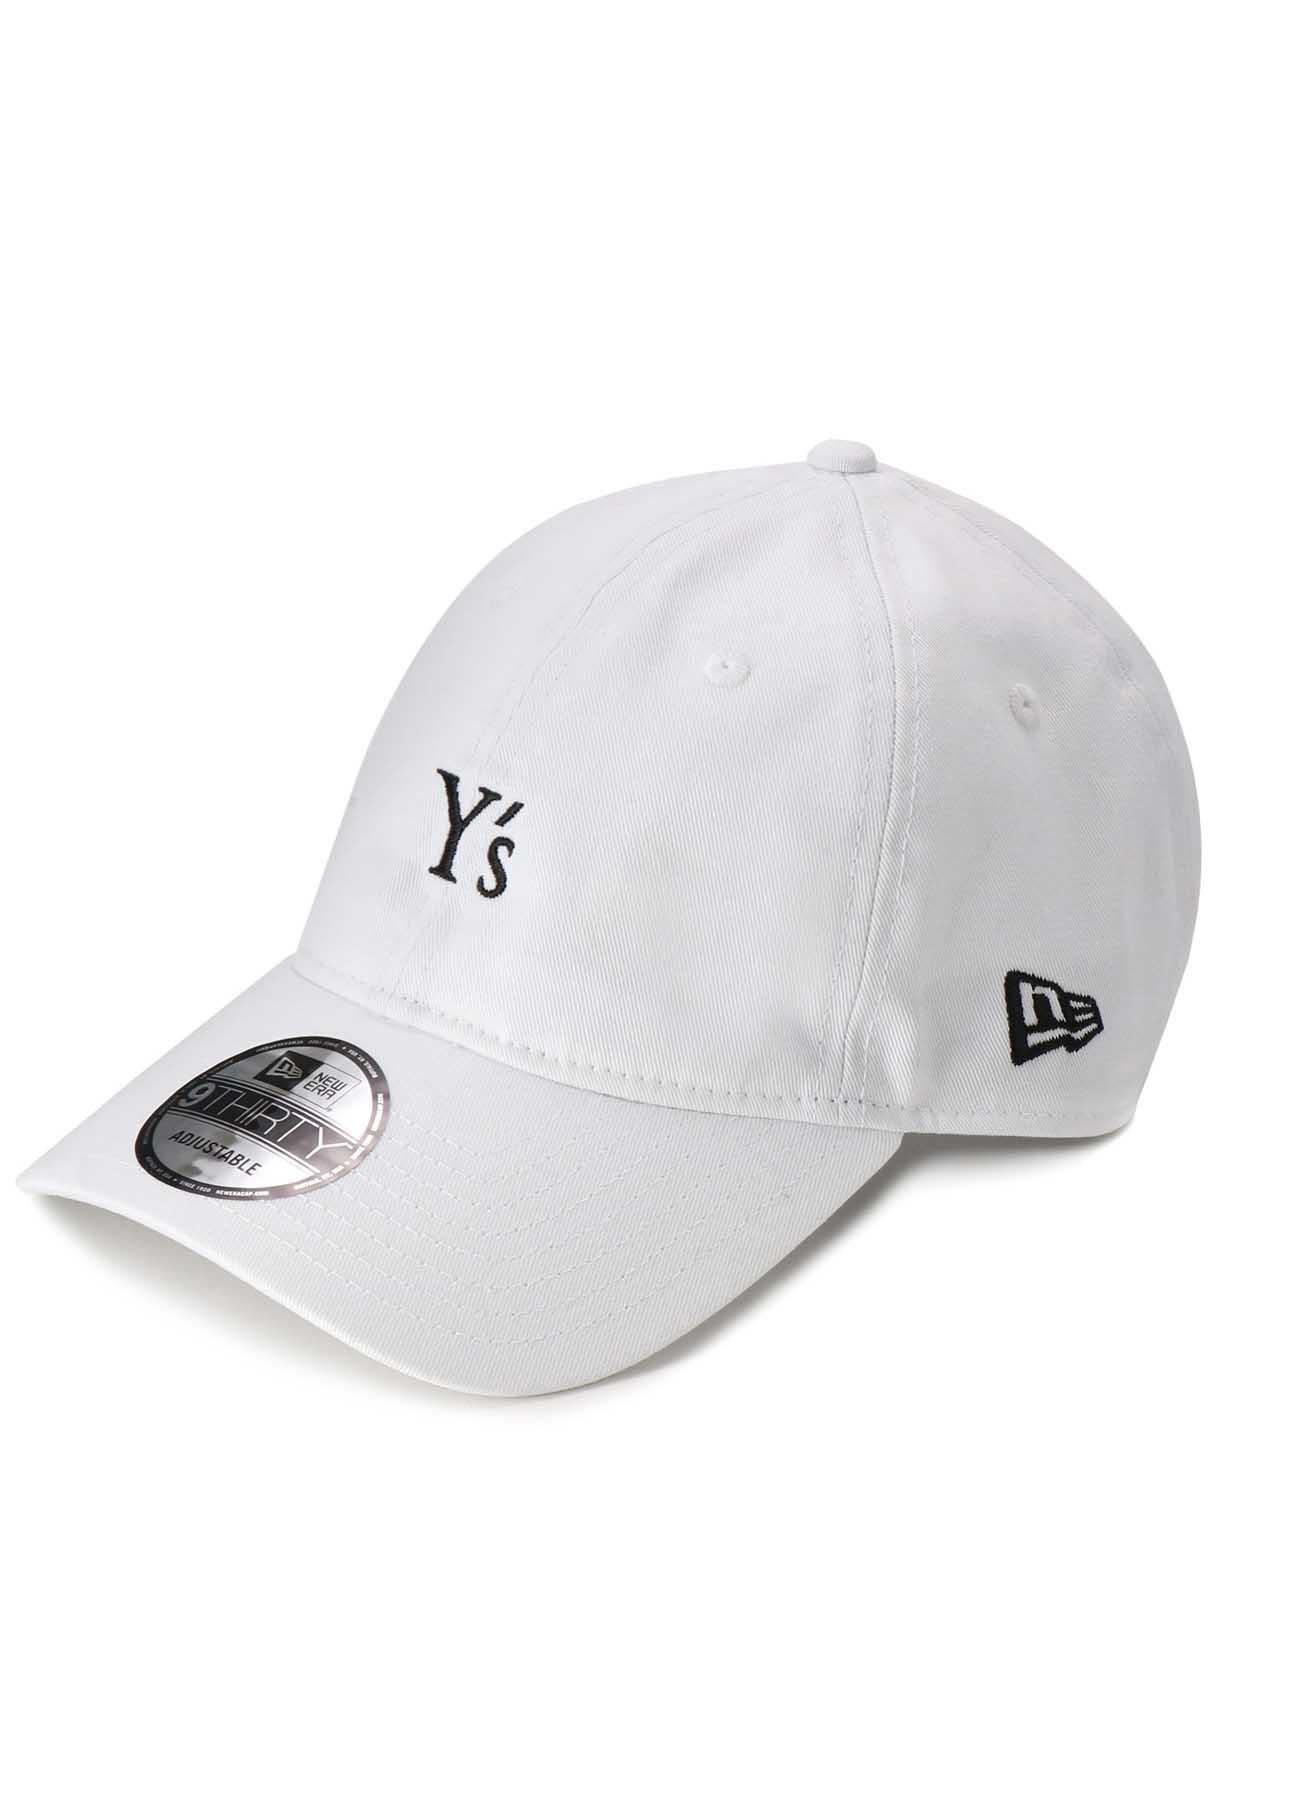 Y's x NEWERA 9THIRTY[WHITE x BLACK]